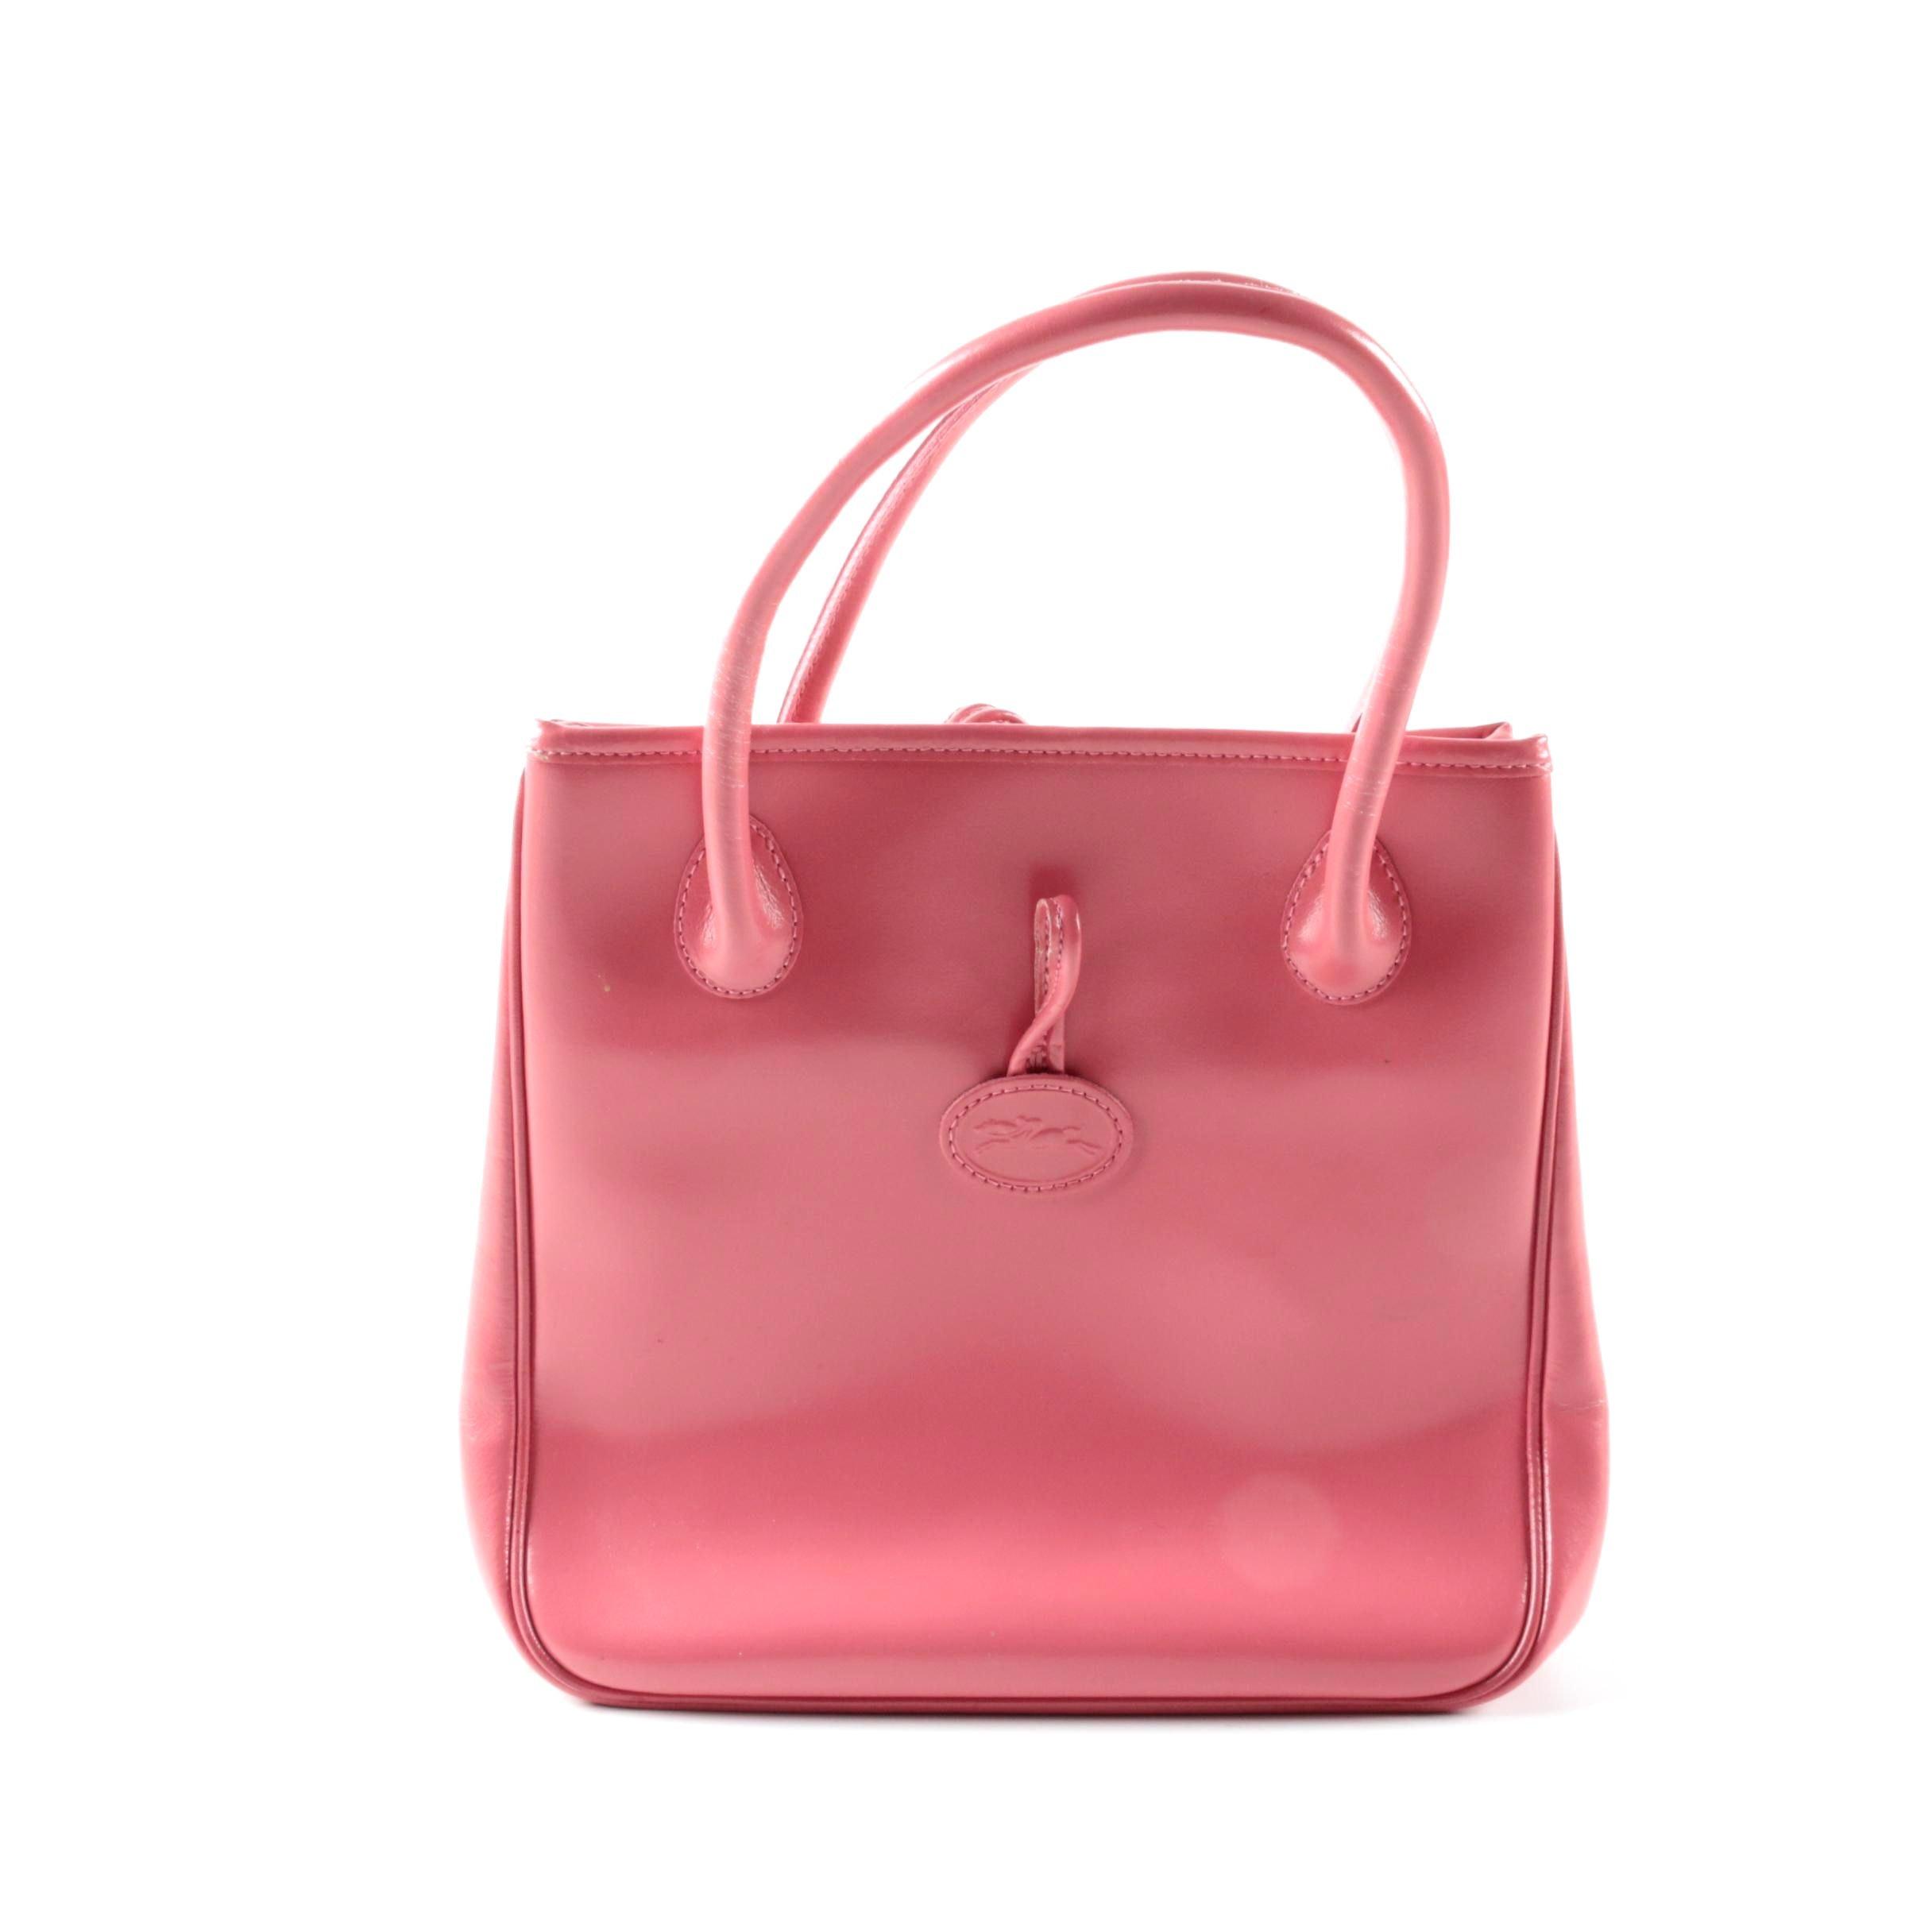 Longchamp Pink Leather Handbag